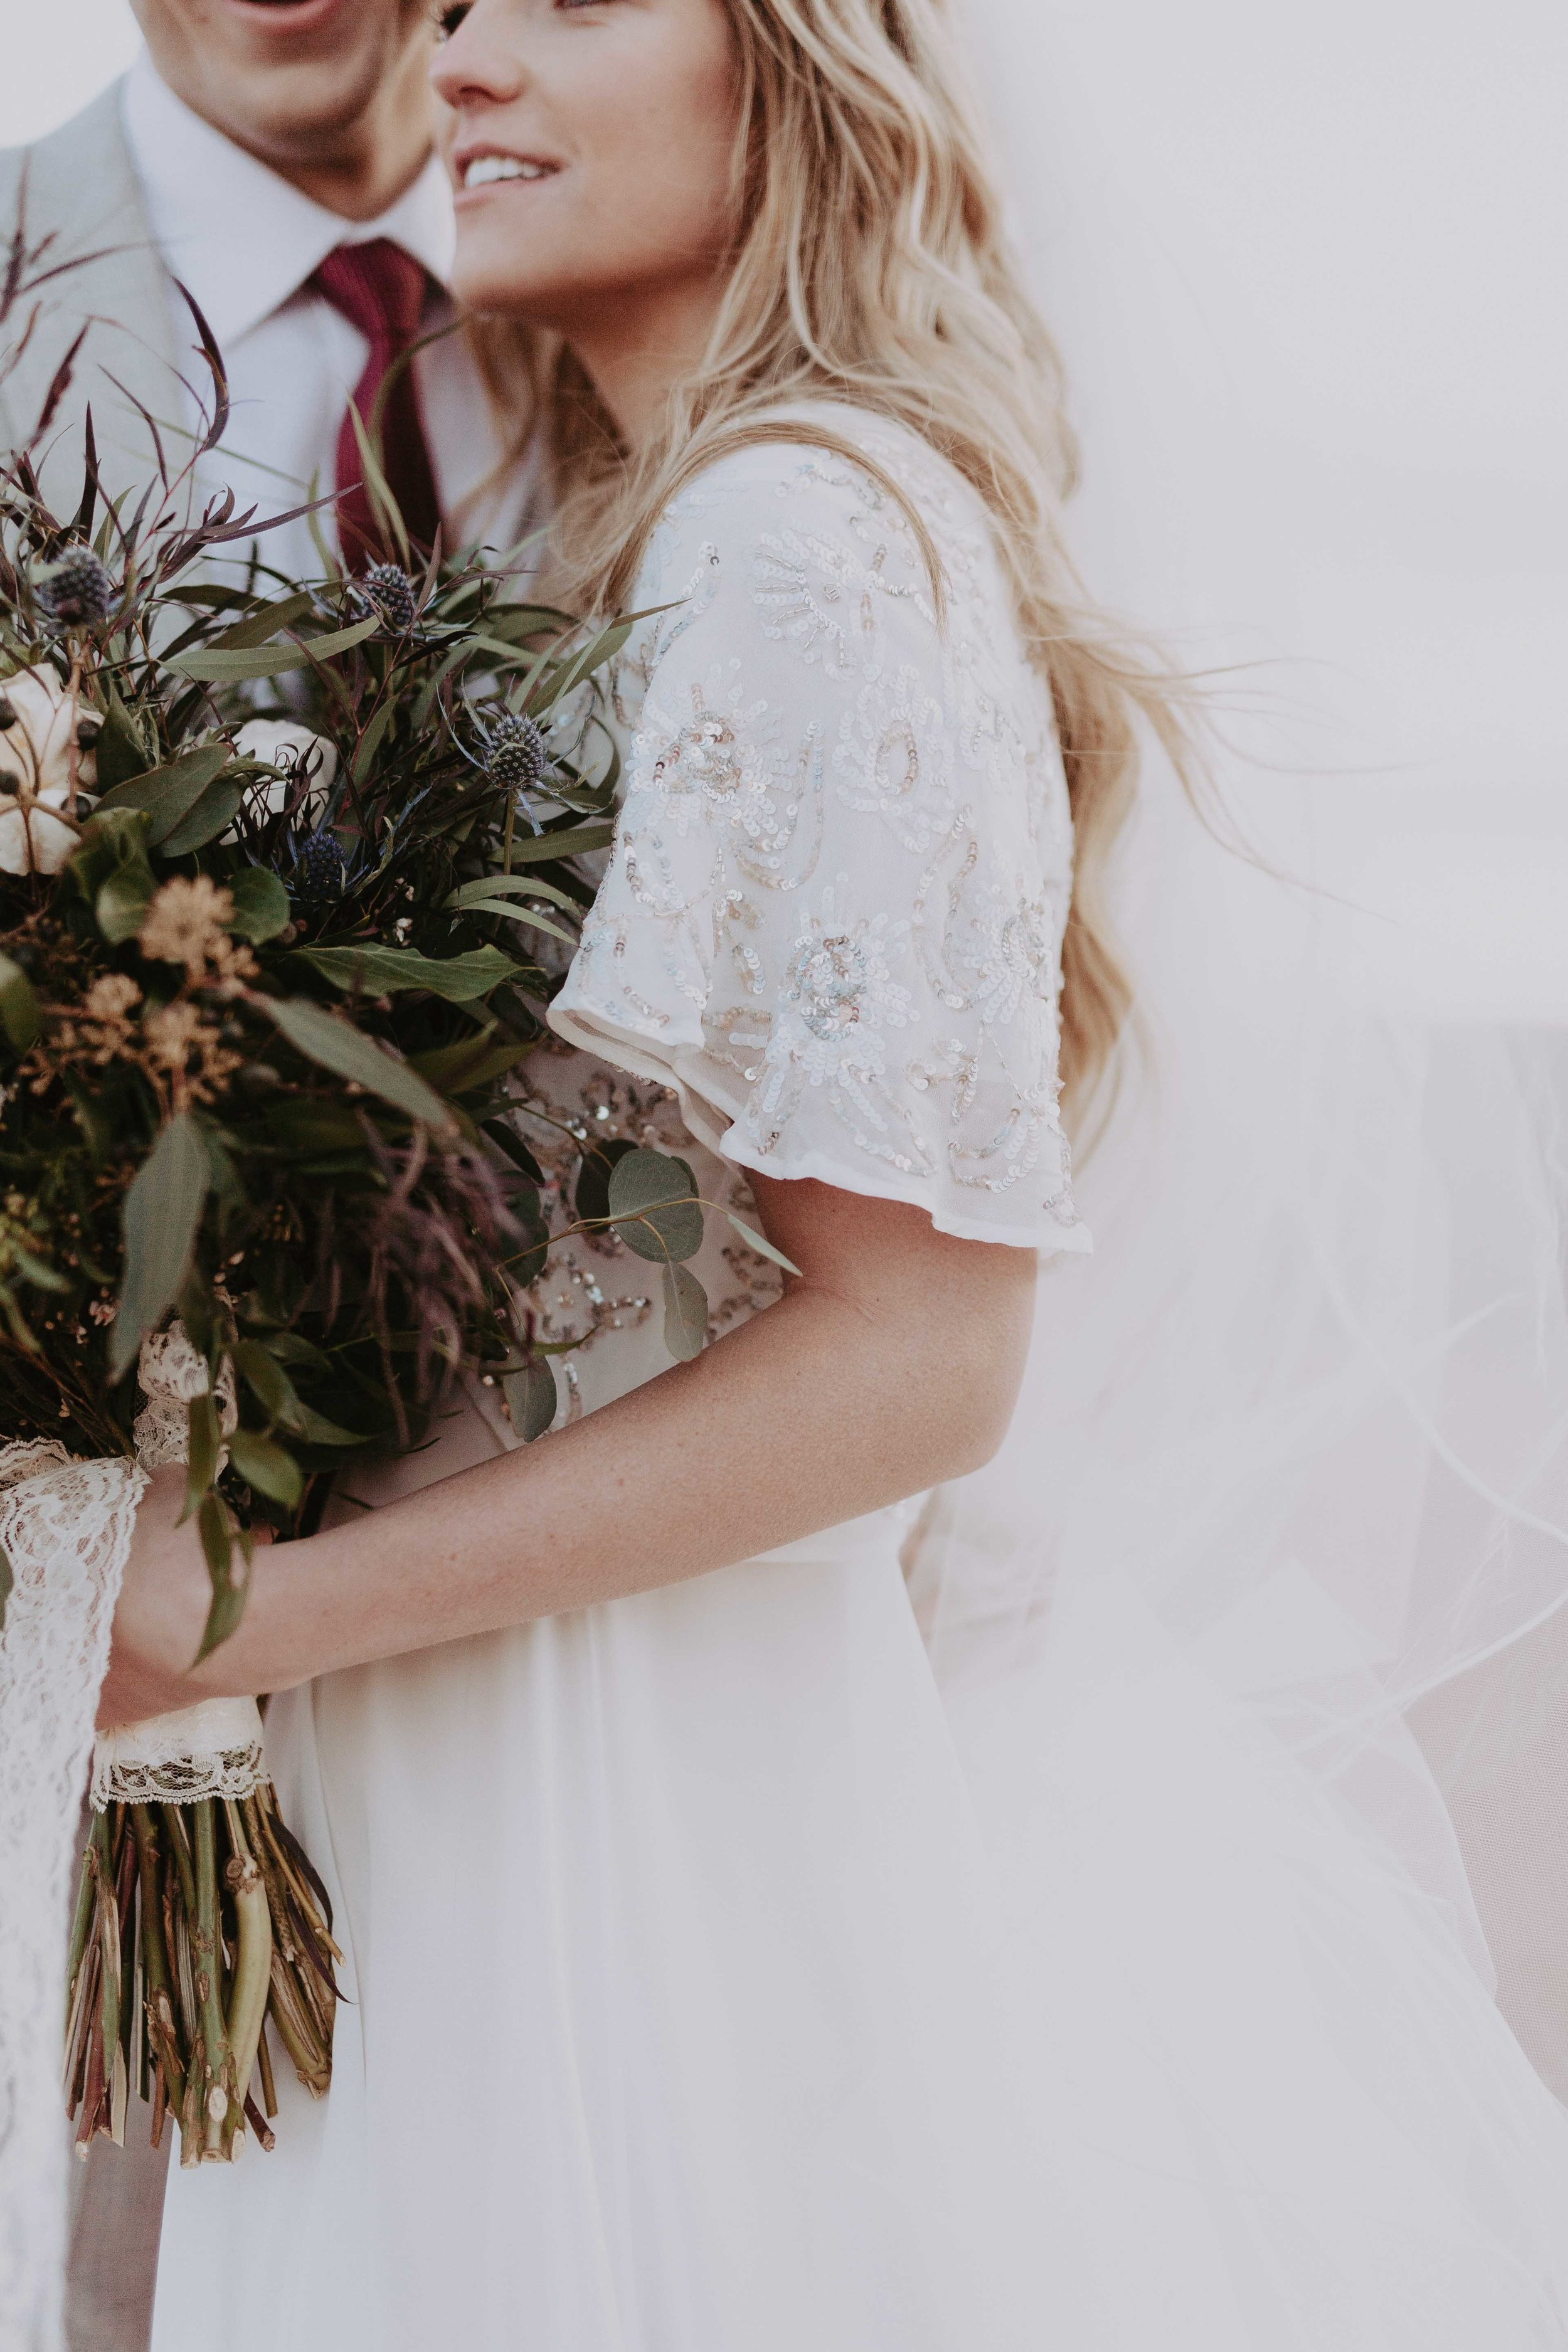 moab-wedding-photographer-49.jpg